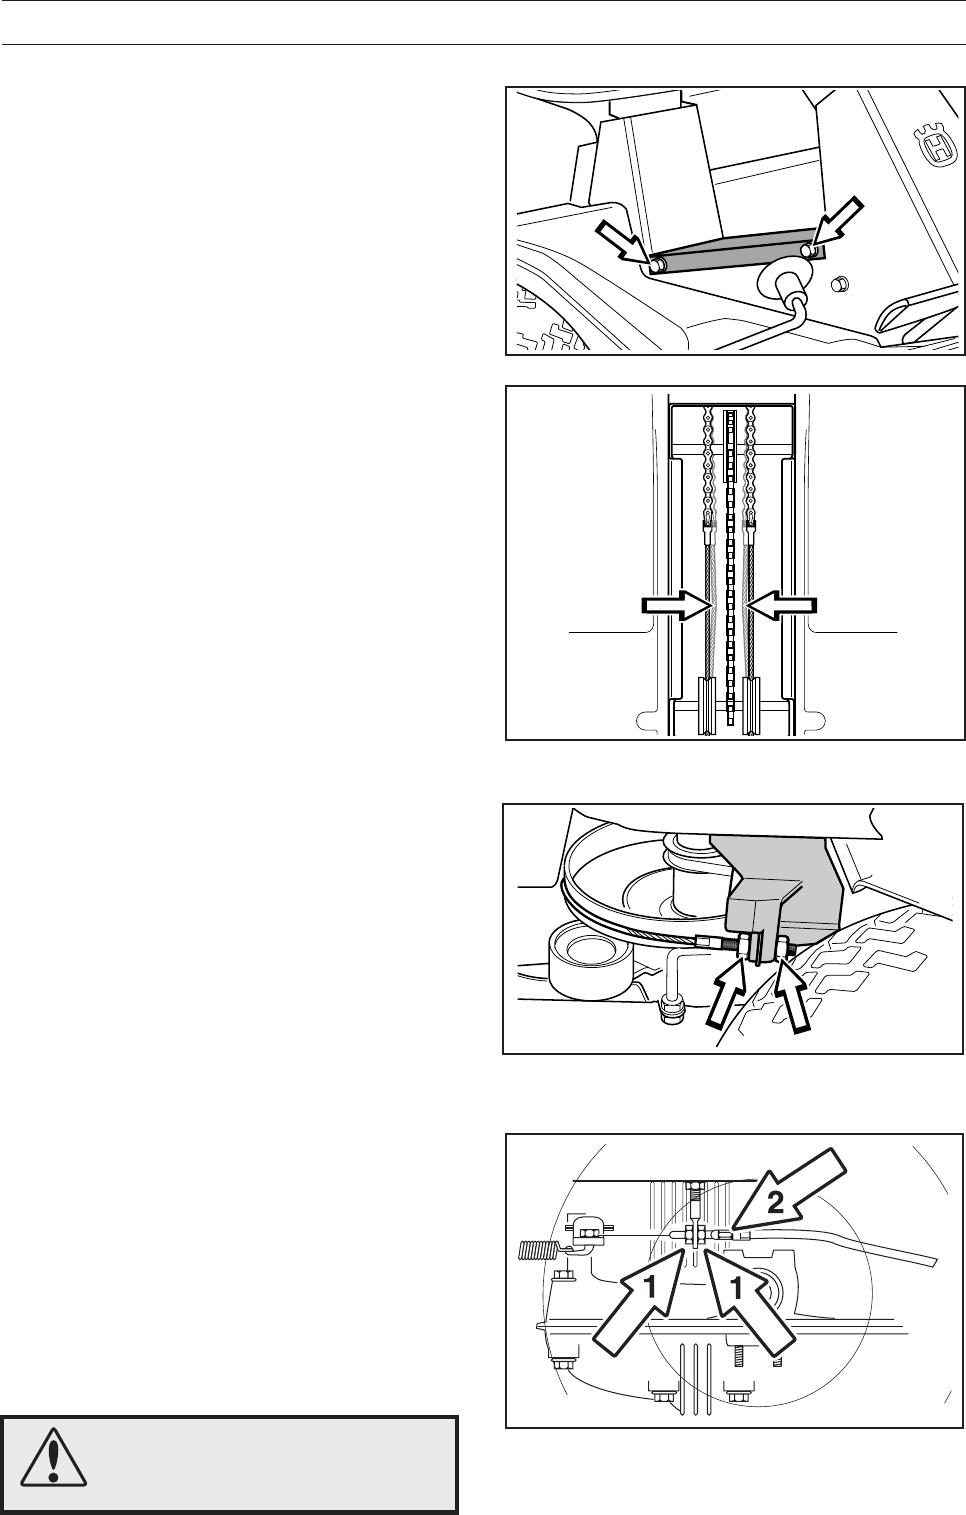 husqvarner rider 155 wiring diagram